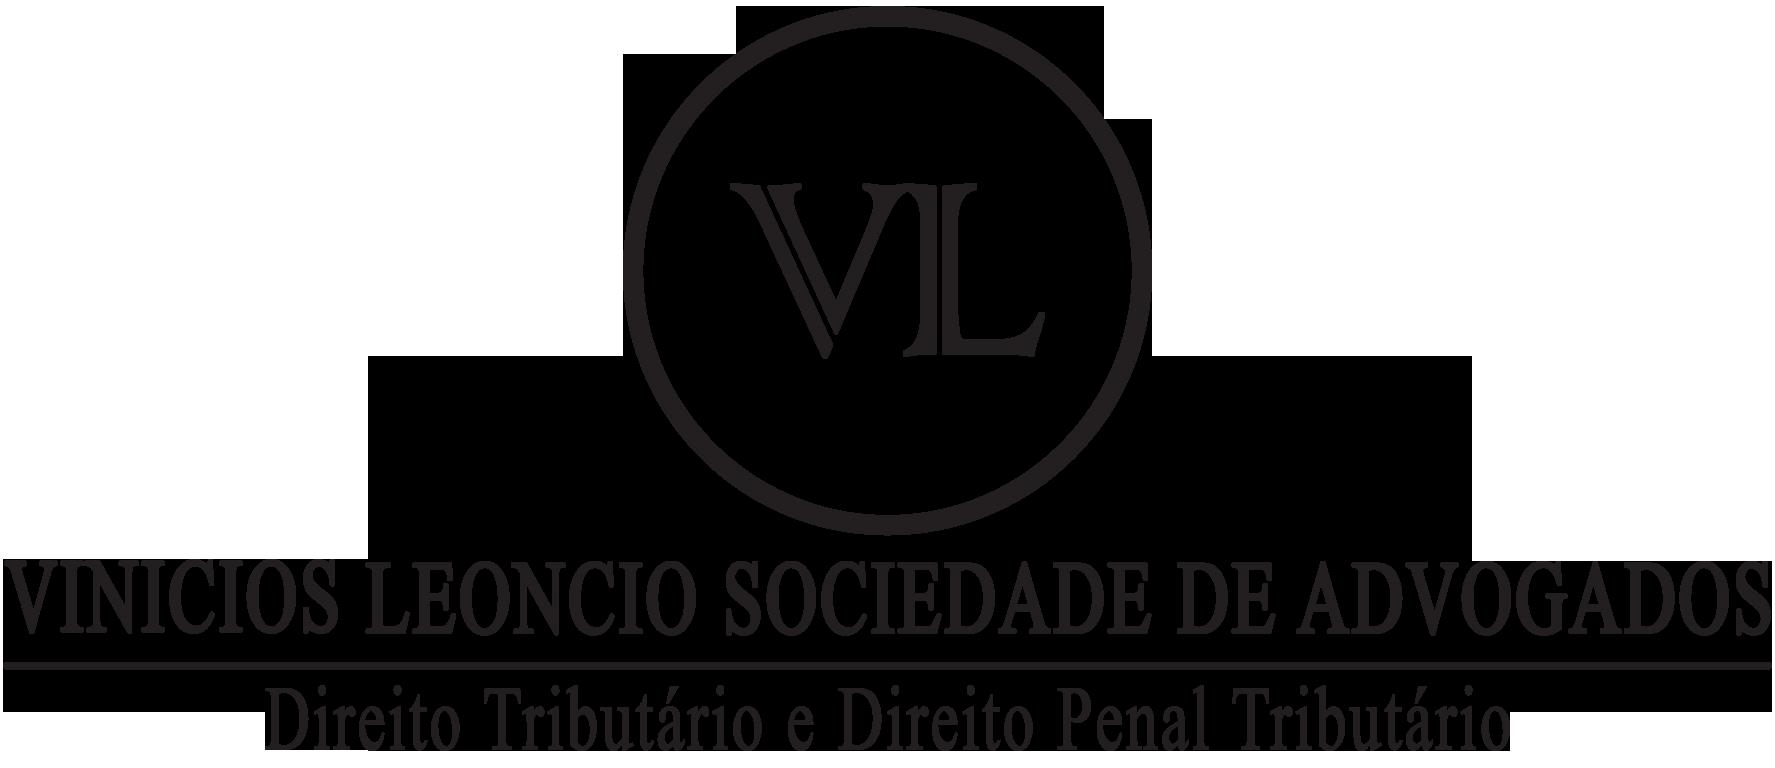 VINICIOS LEONCIO